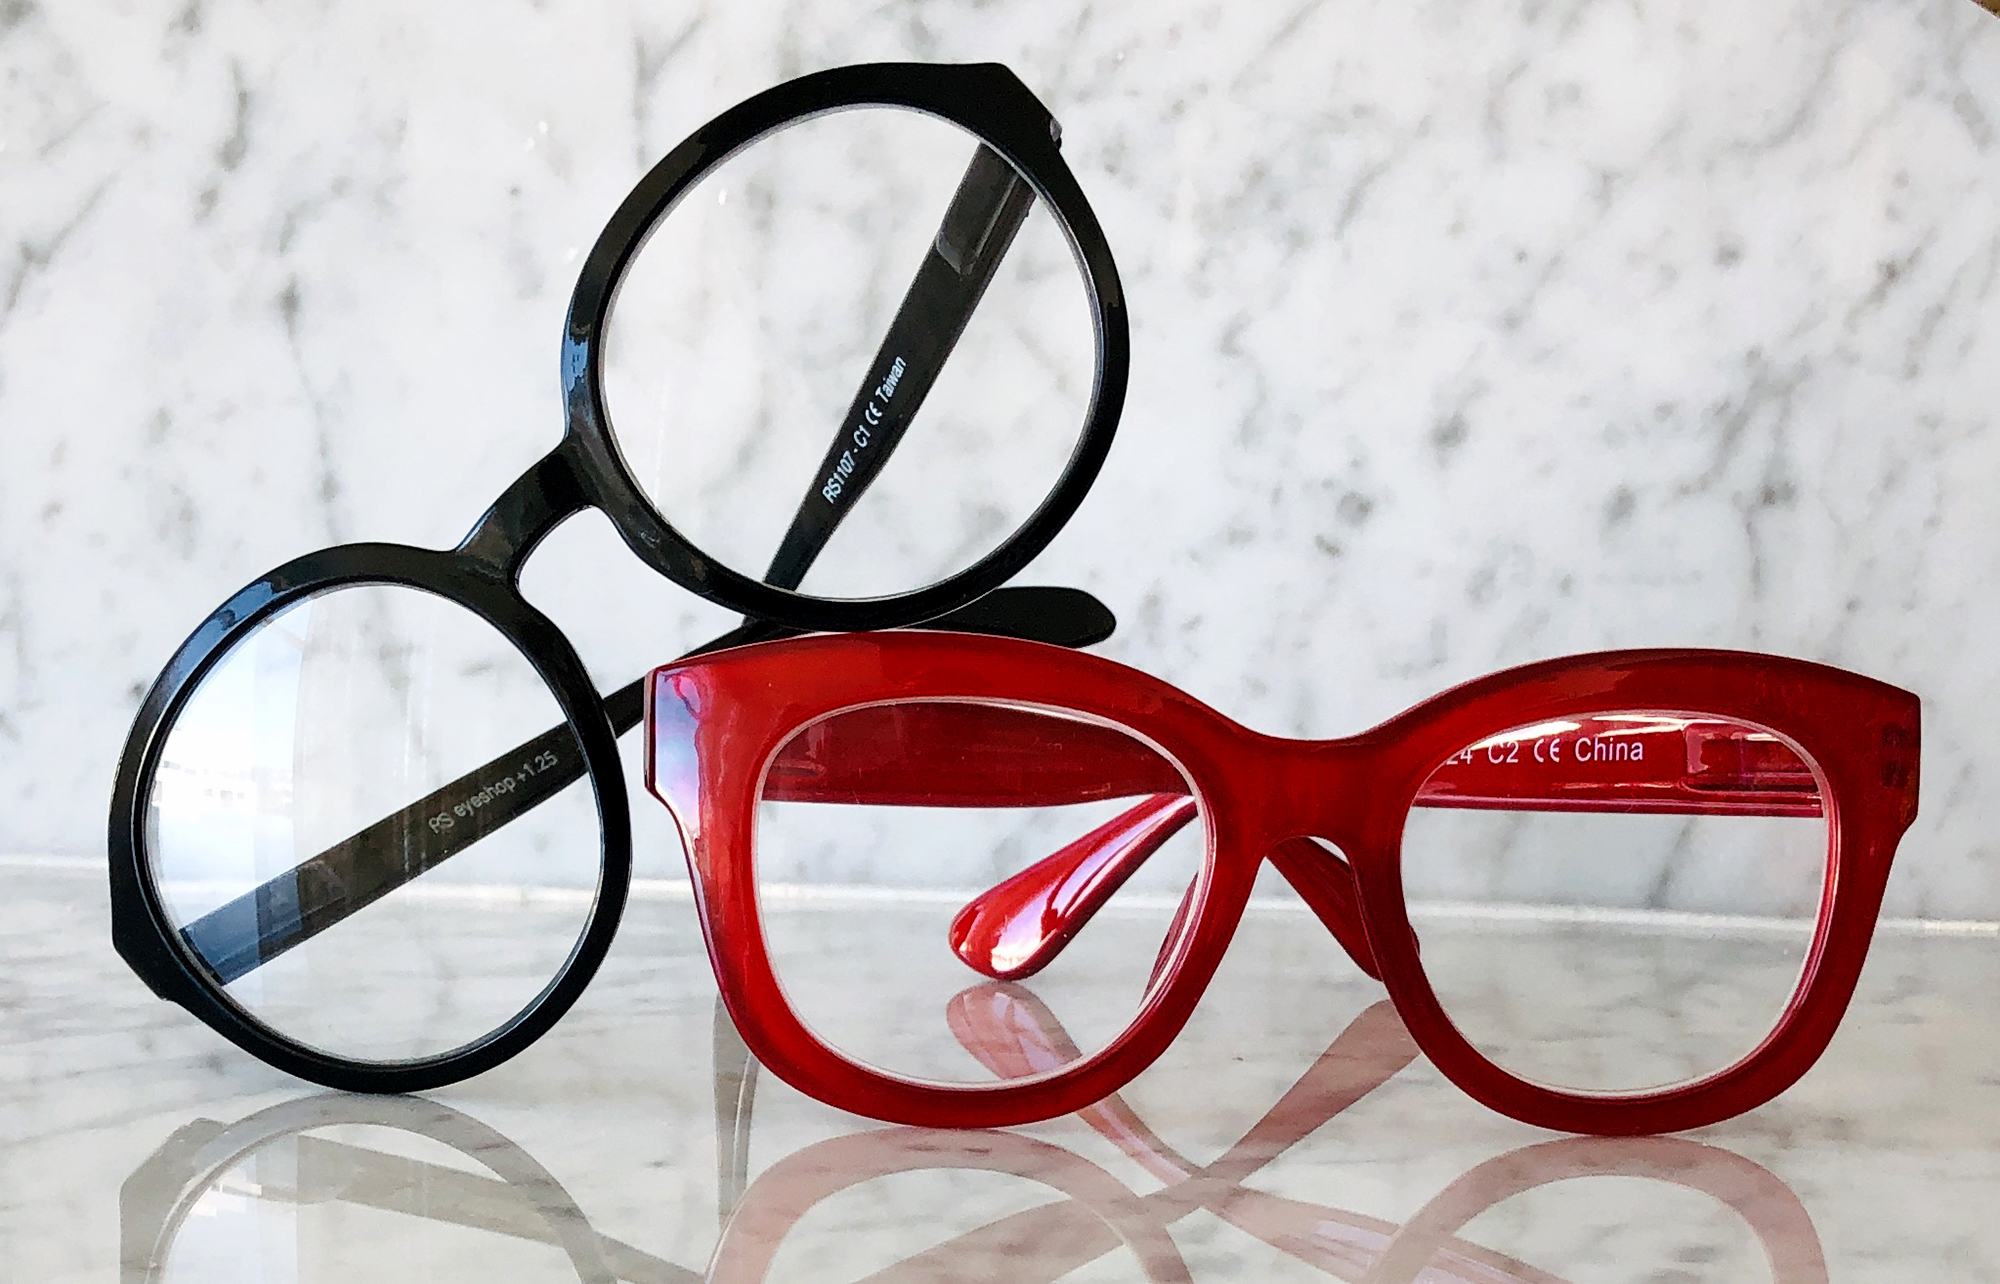 Ryan Simkhai Eyeshop: Readers